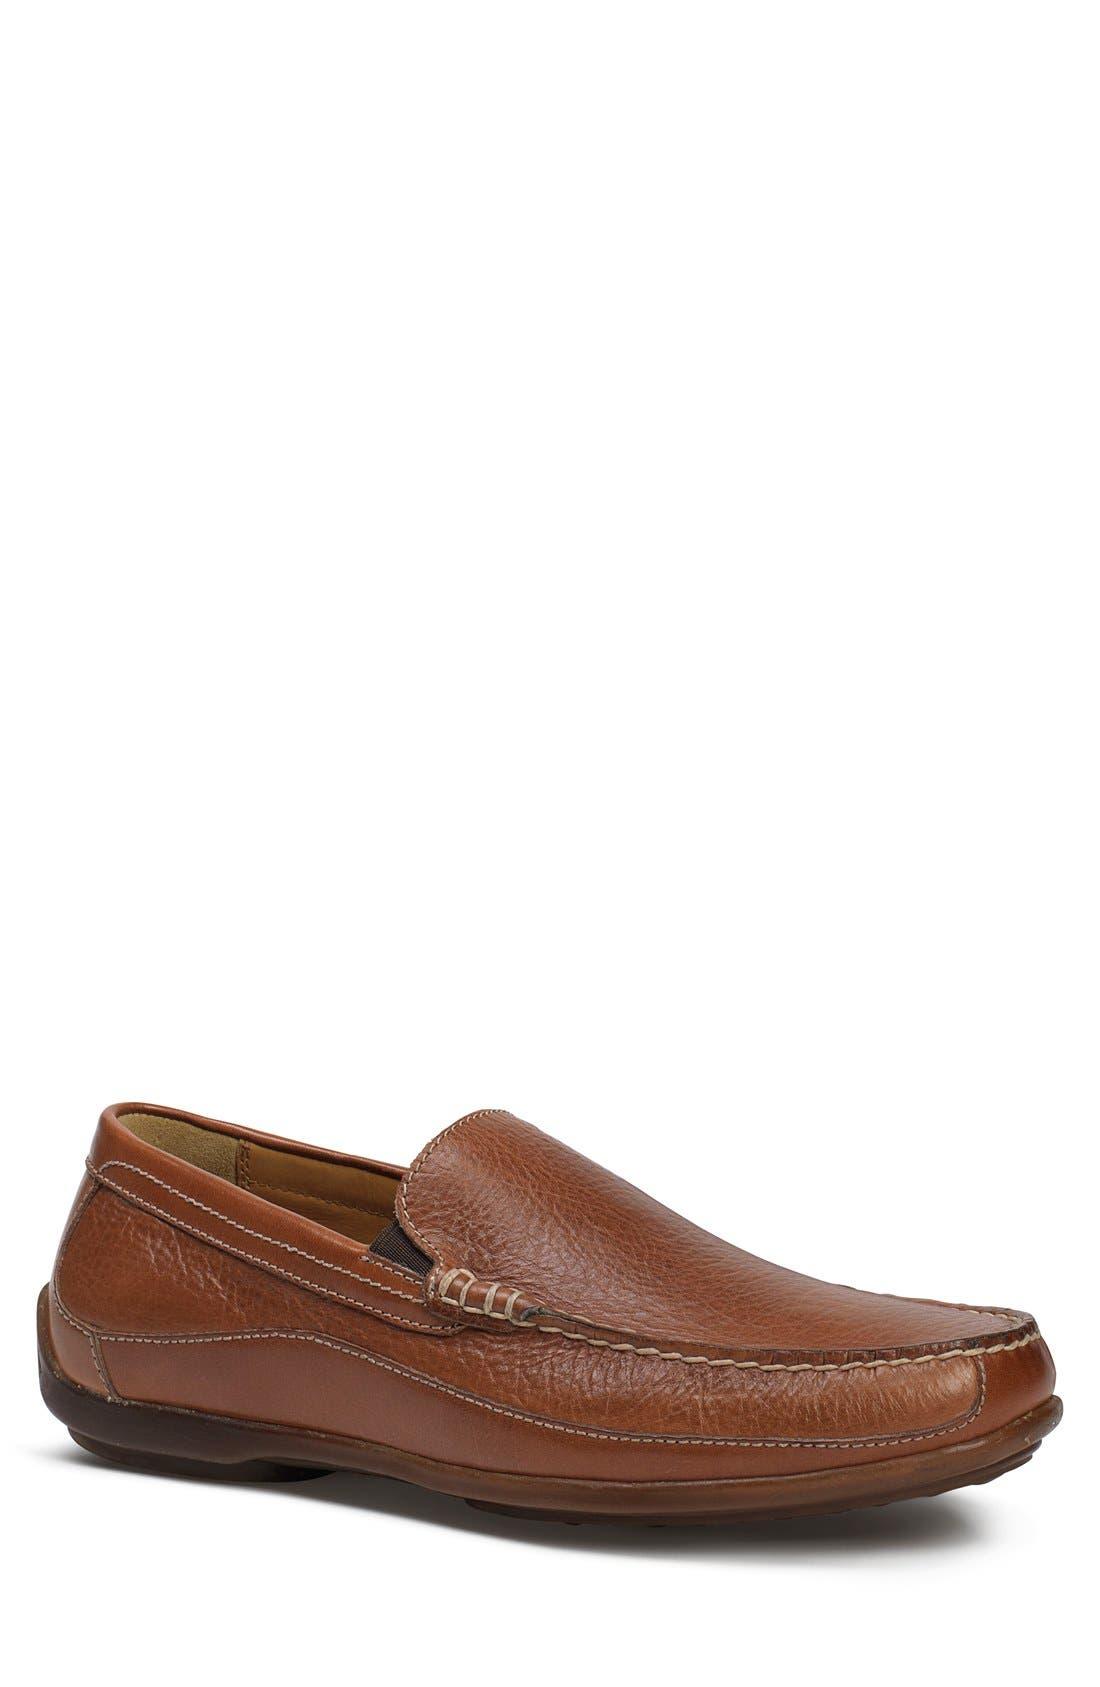 'Declan' Moc Toe Venetian Slip-On,                         Main,                         color, Saddle Tan